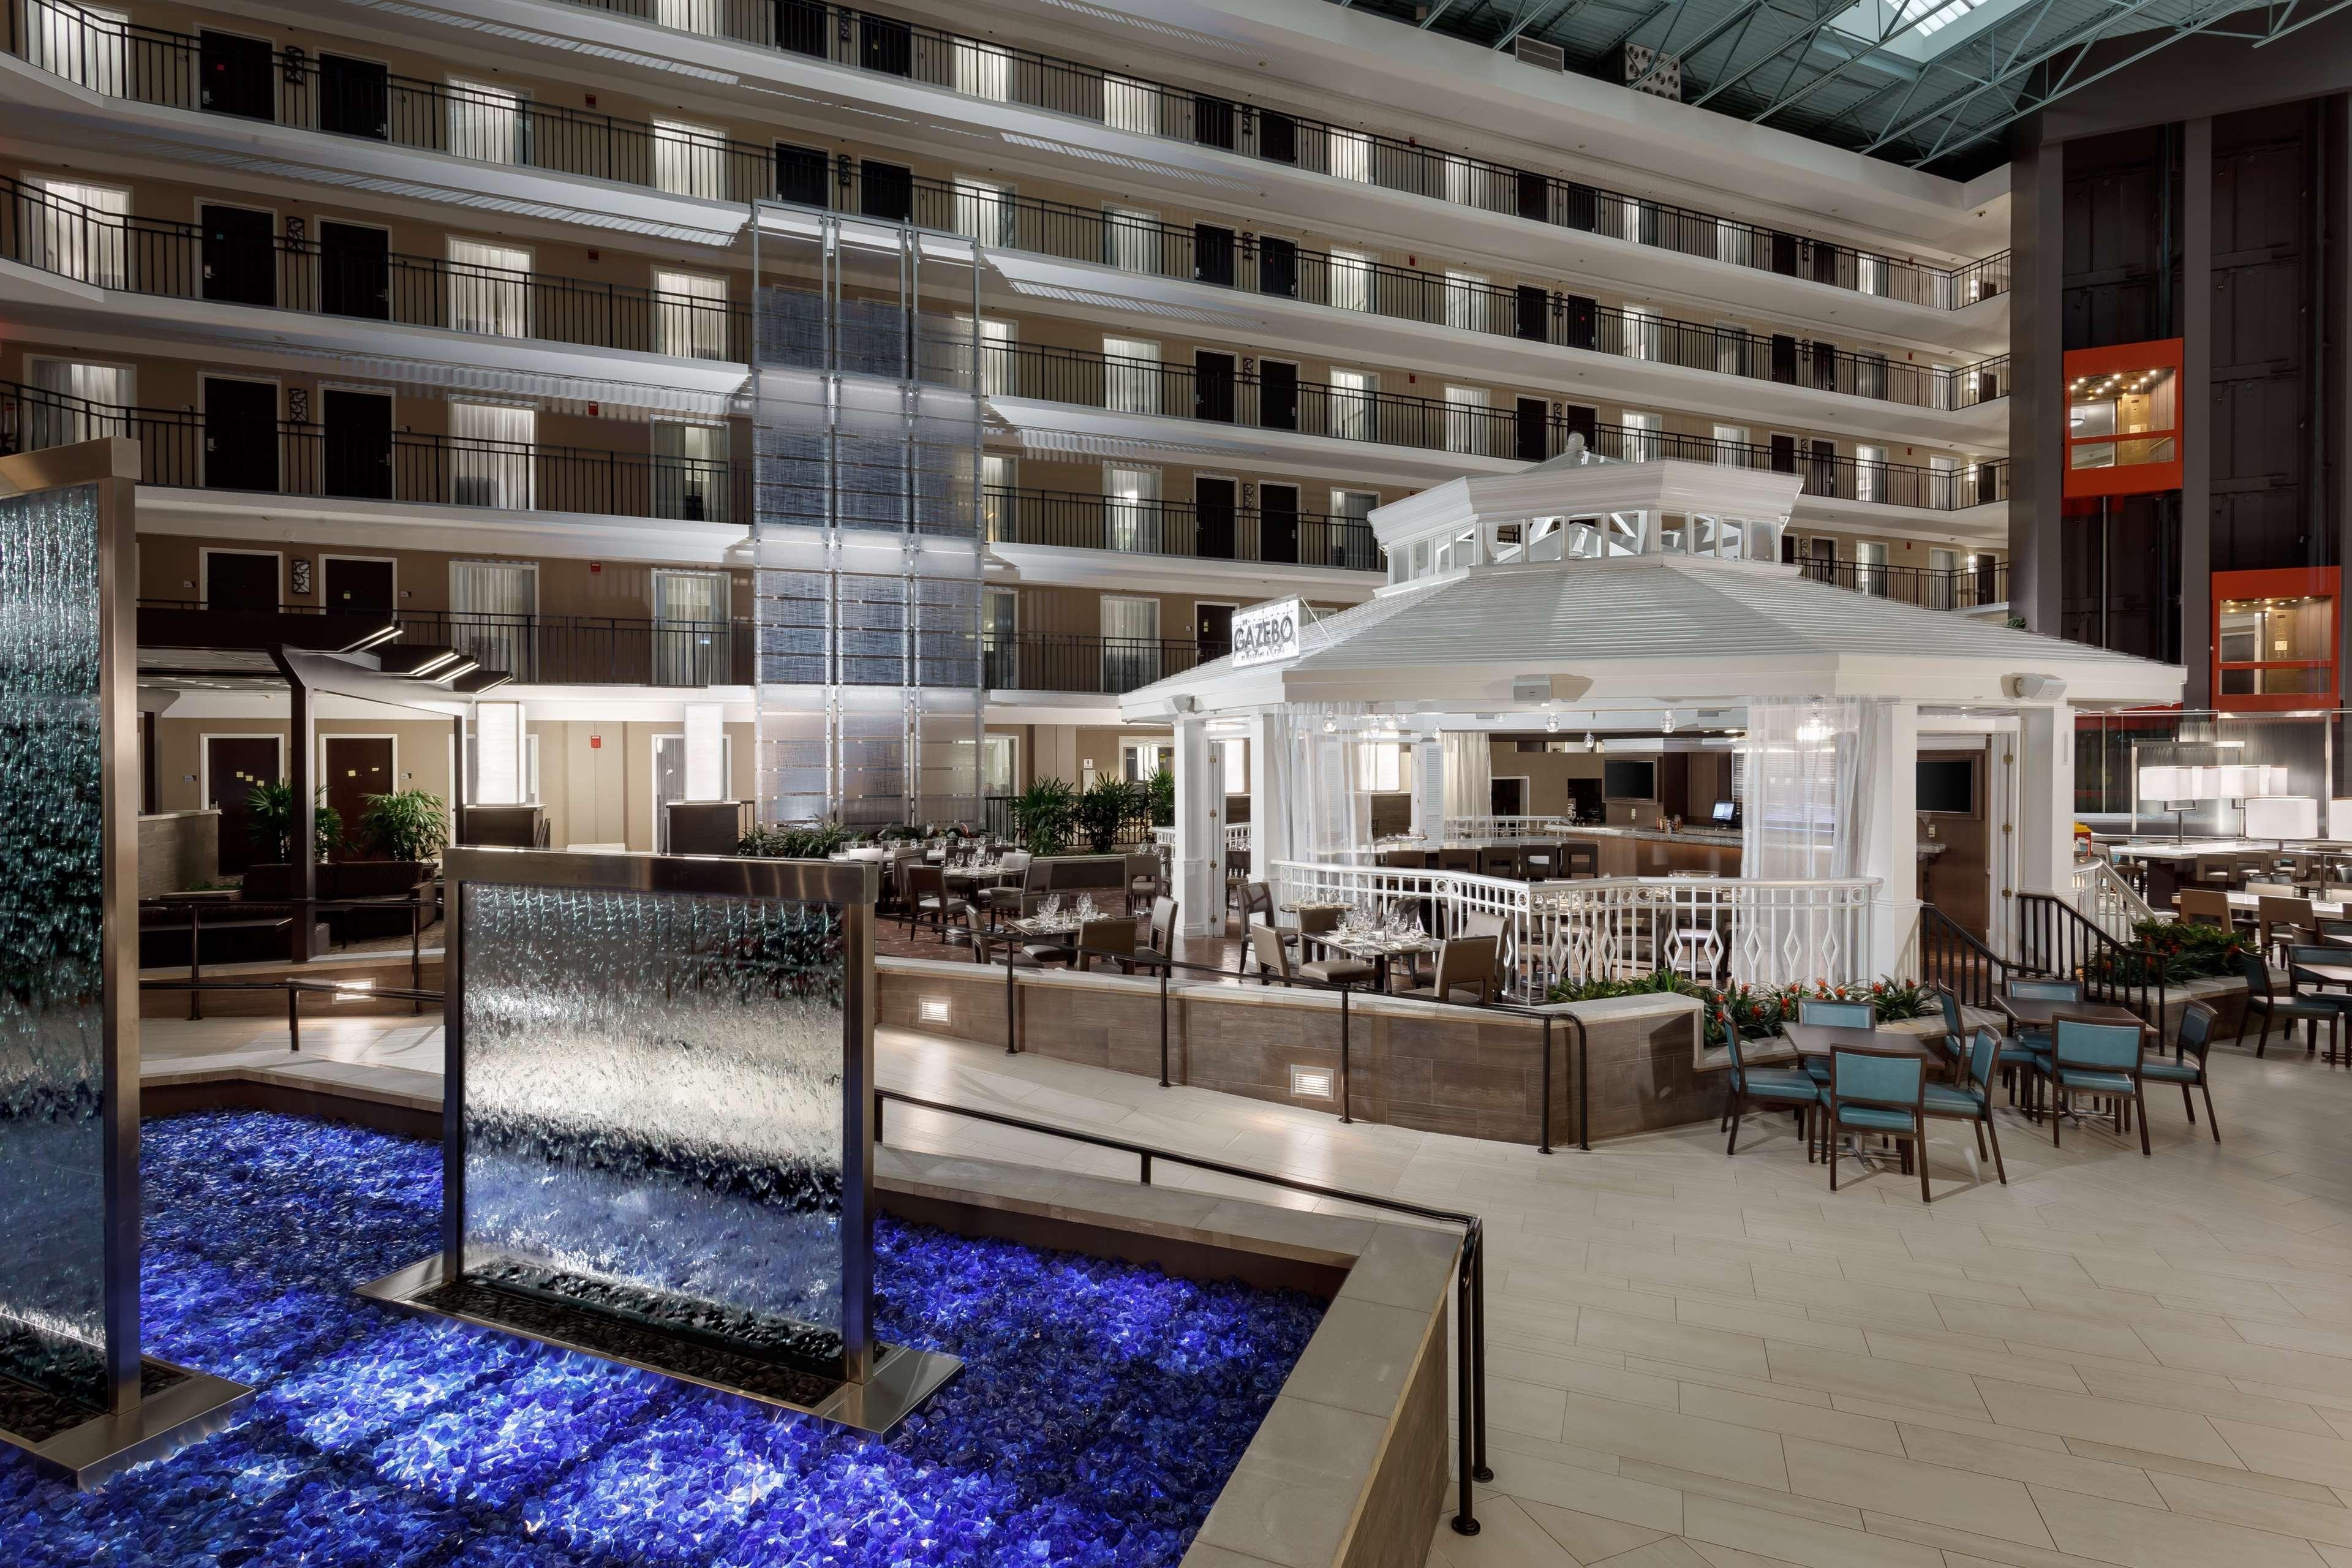 Embassy Suites by Hilton Orlando Lake Buena Vista Resort image 5